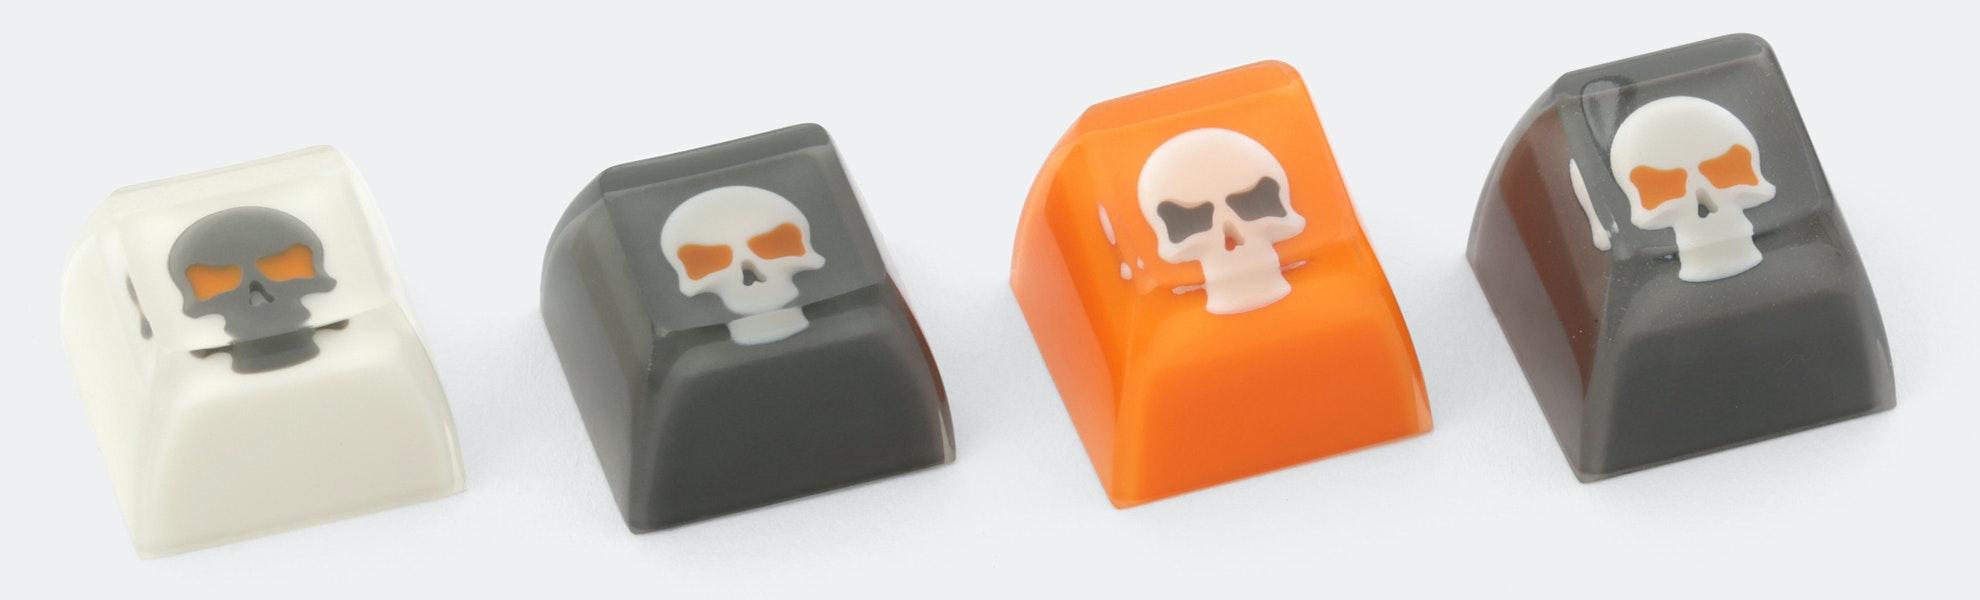 Hammer SA Carbon Artisan Keycap